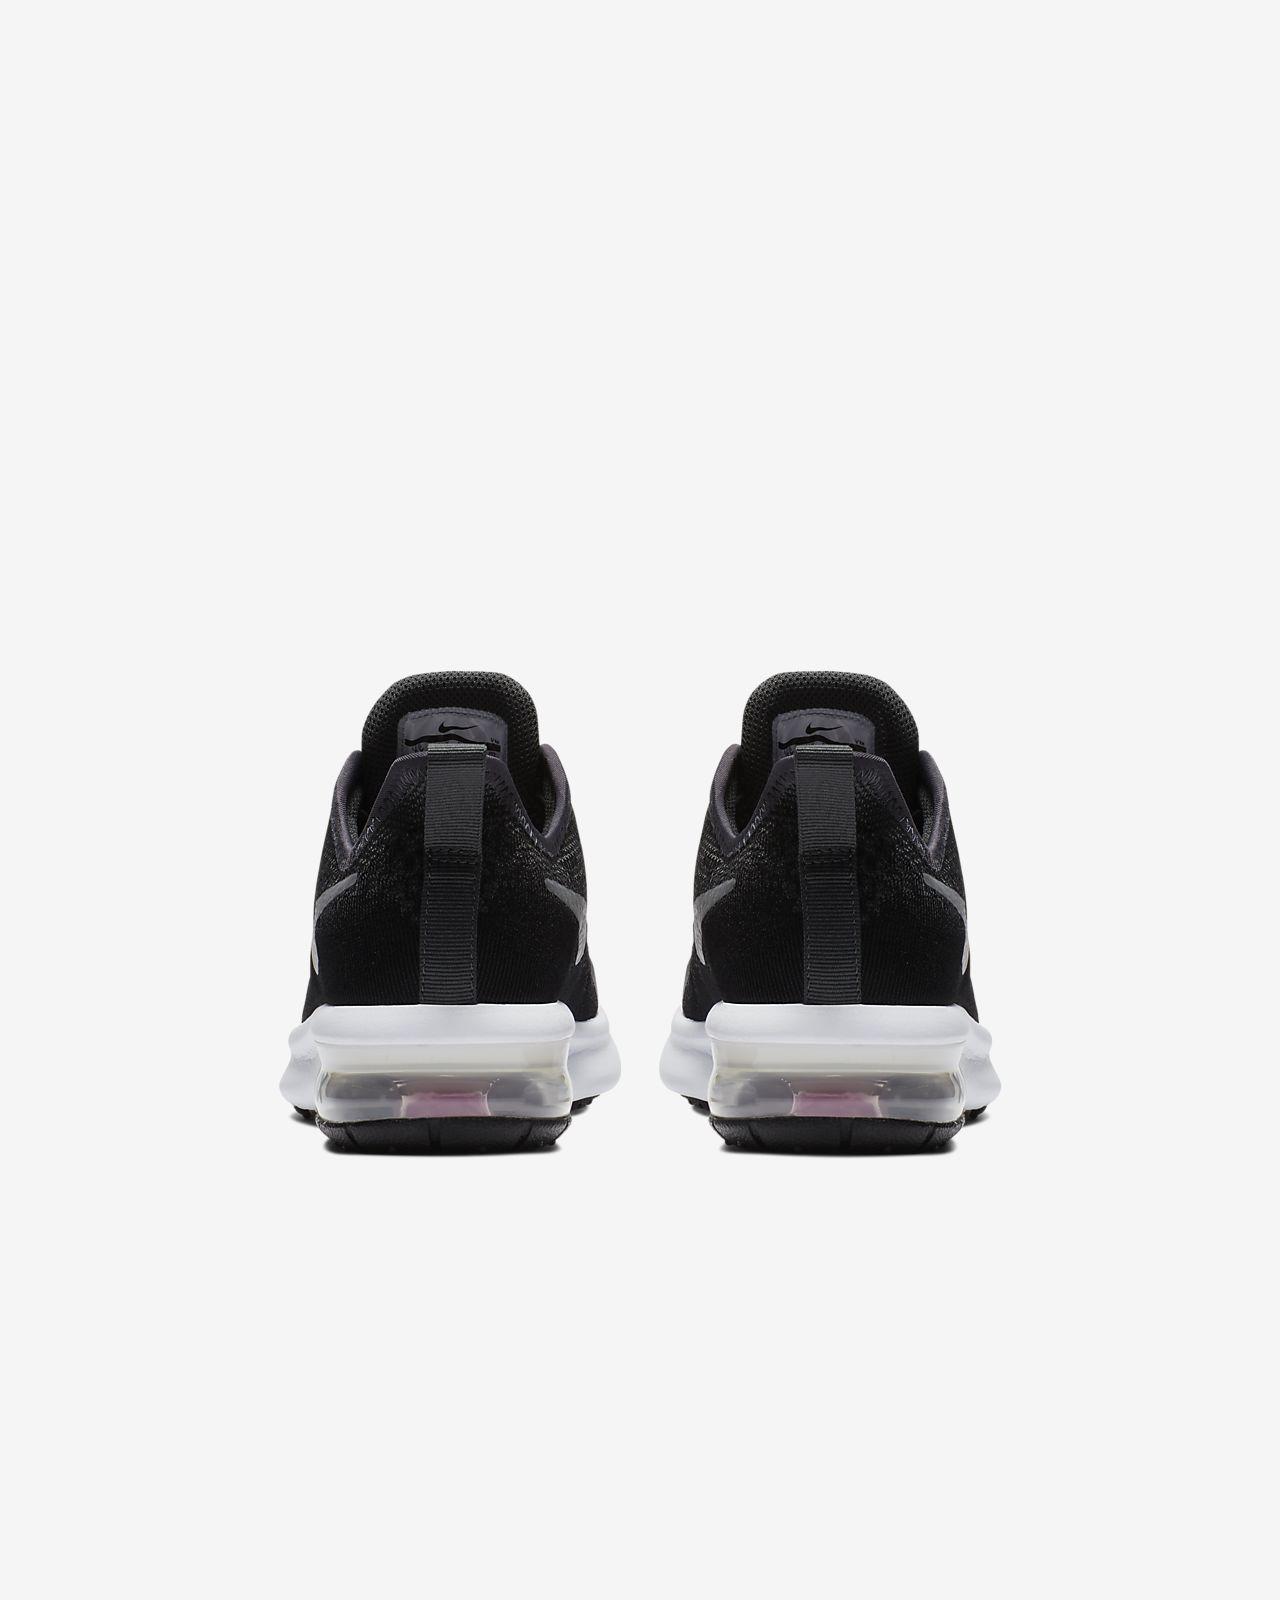 Tênis Nike Sportswear Air Max Sequent 4 Preto Compre Agora